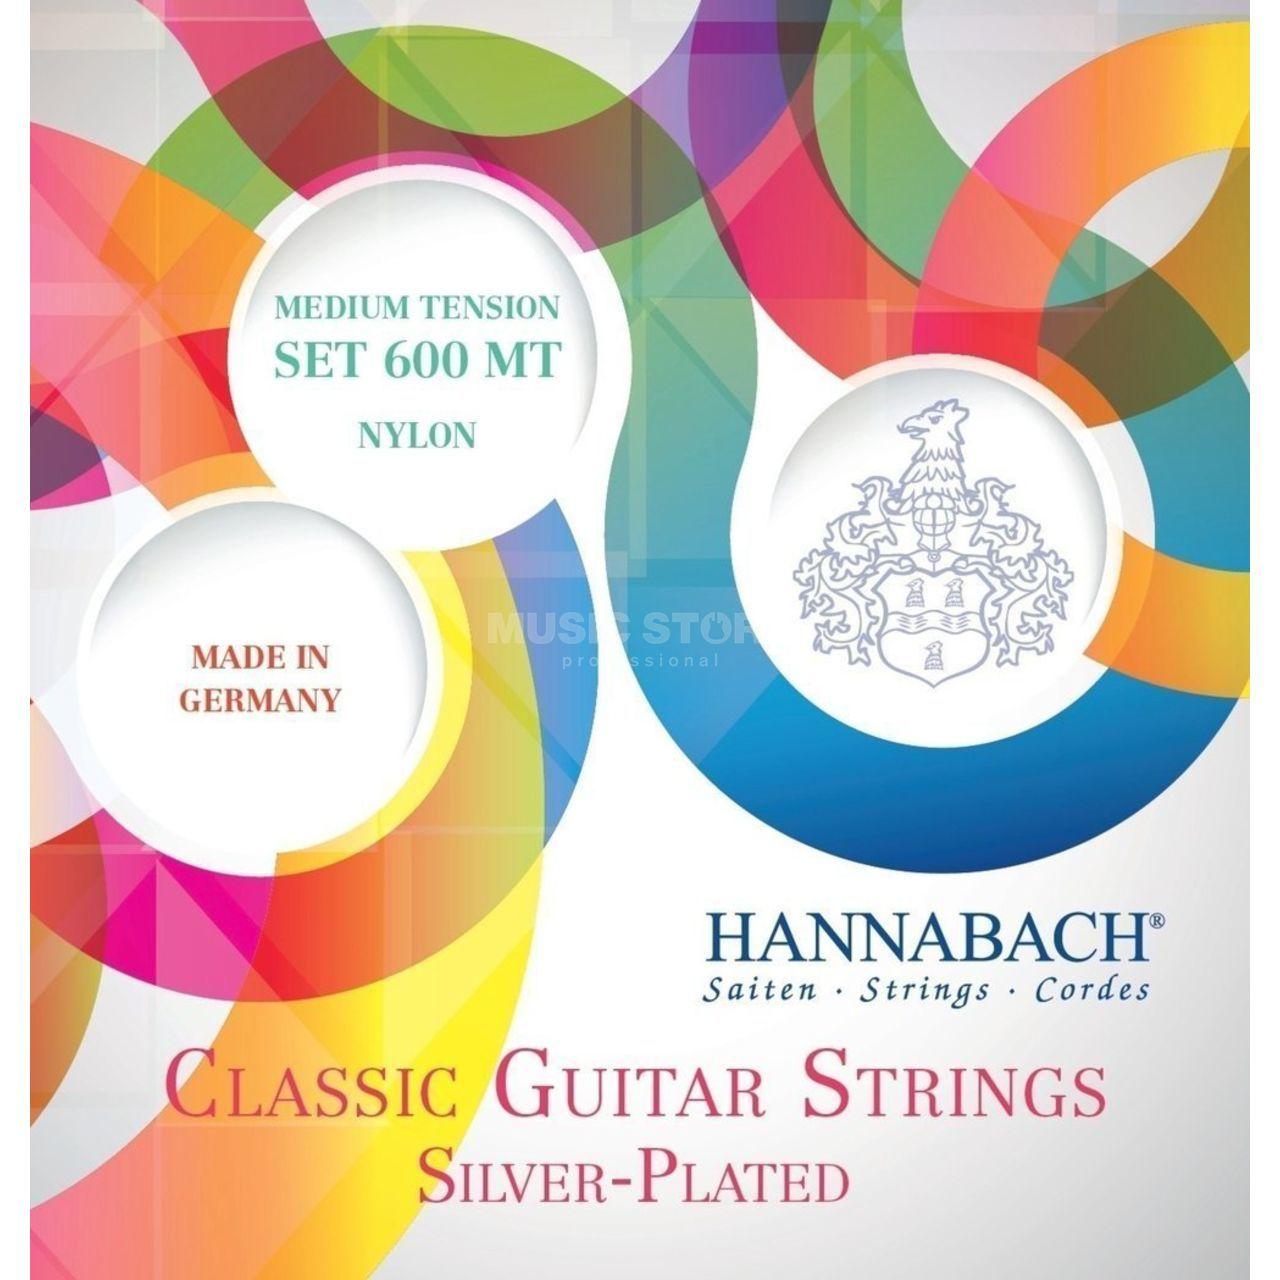 Hannabach K-Git Saiten Satz 600 MT Silver Plated   MUSIC